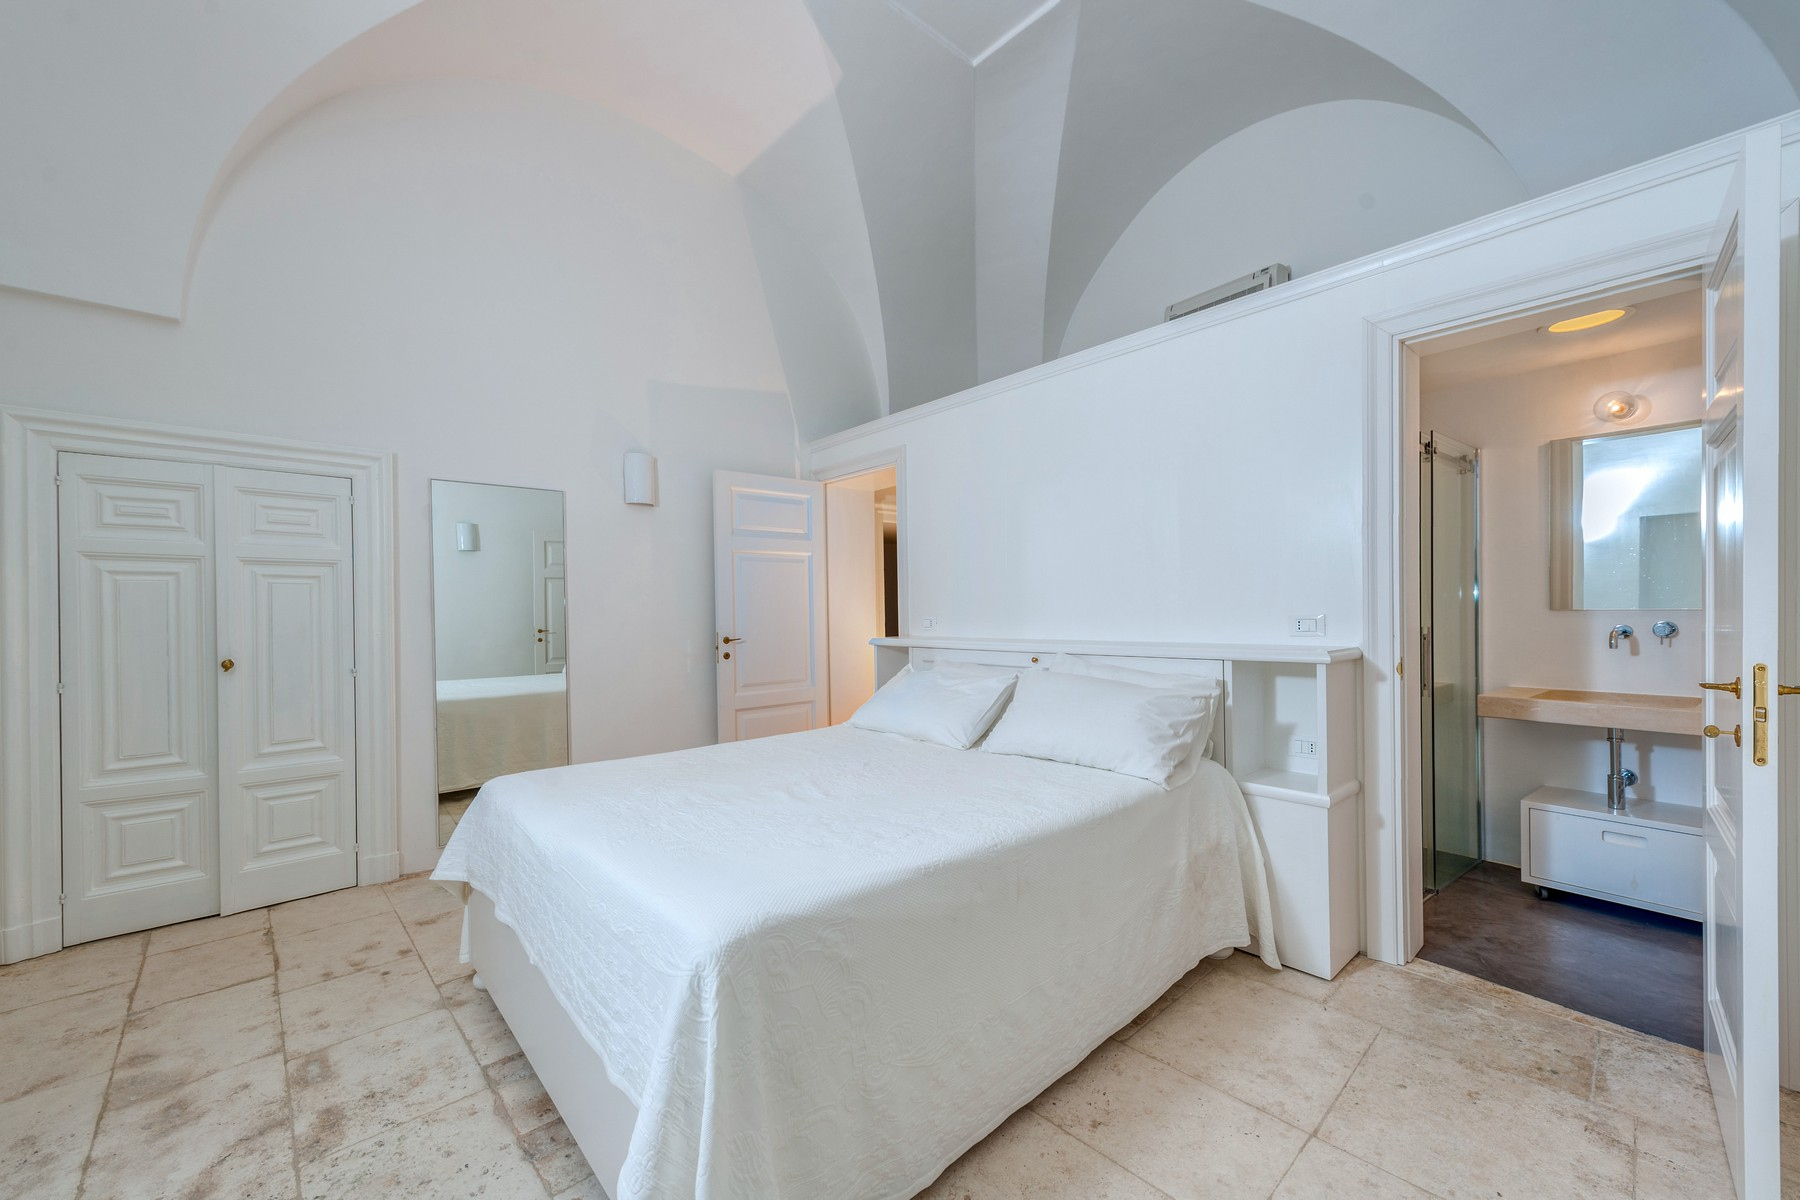 Appartamento in Vendita a Ostuni: 5 locali, 265 mq - Foto 17